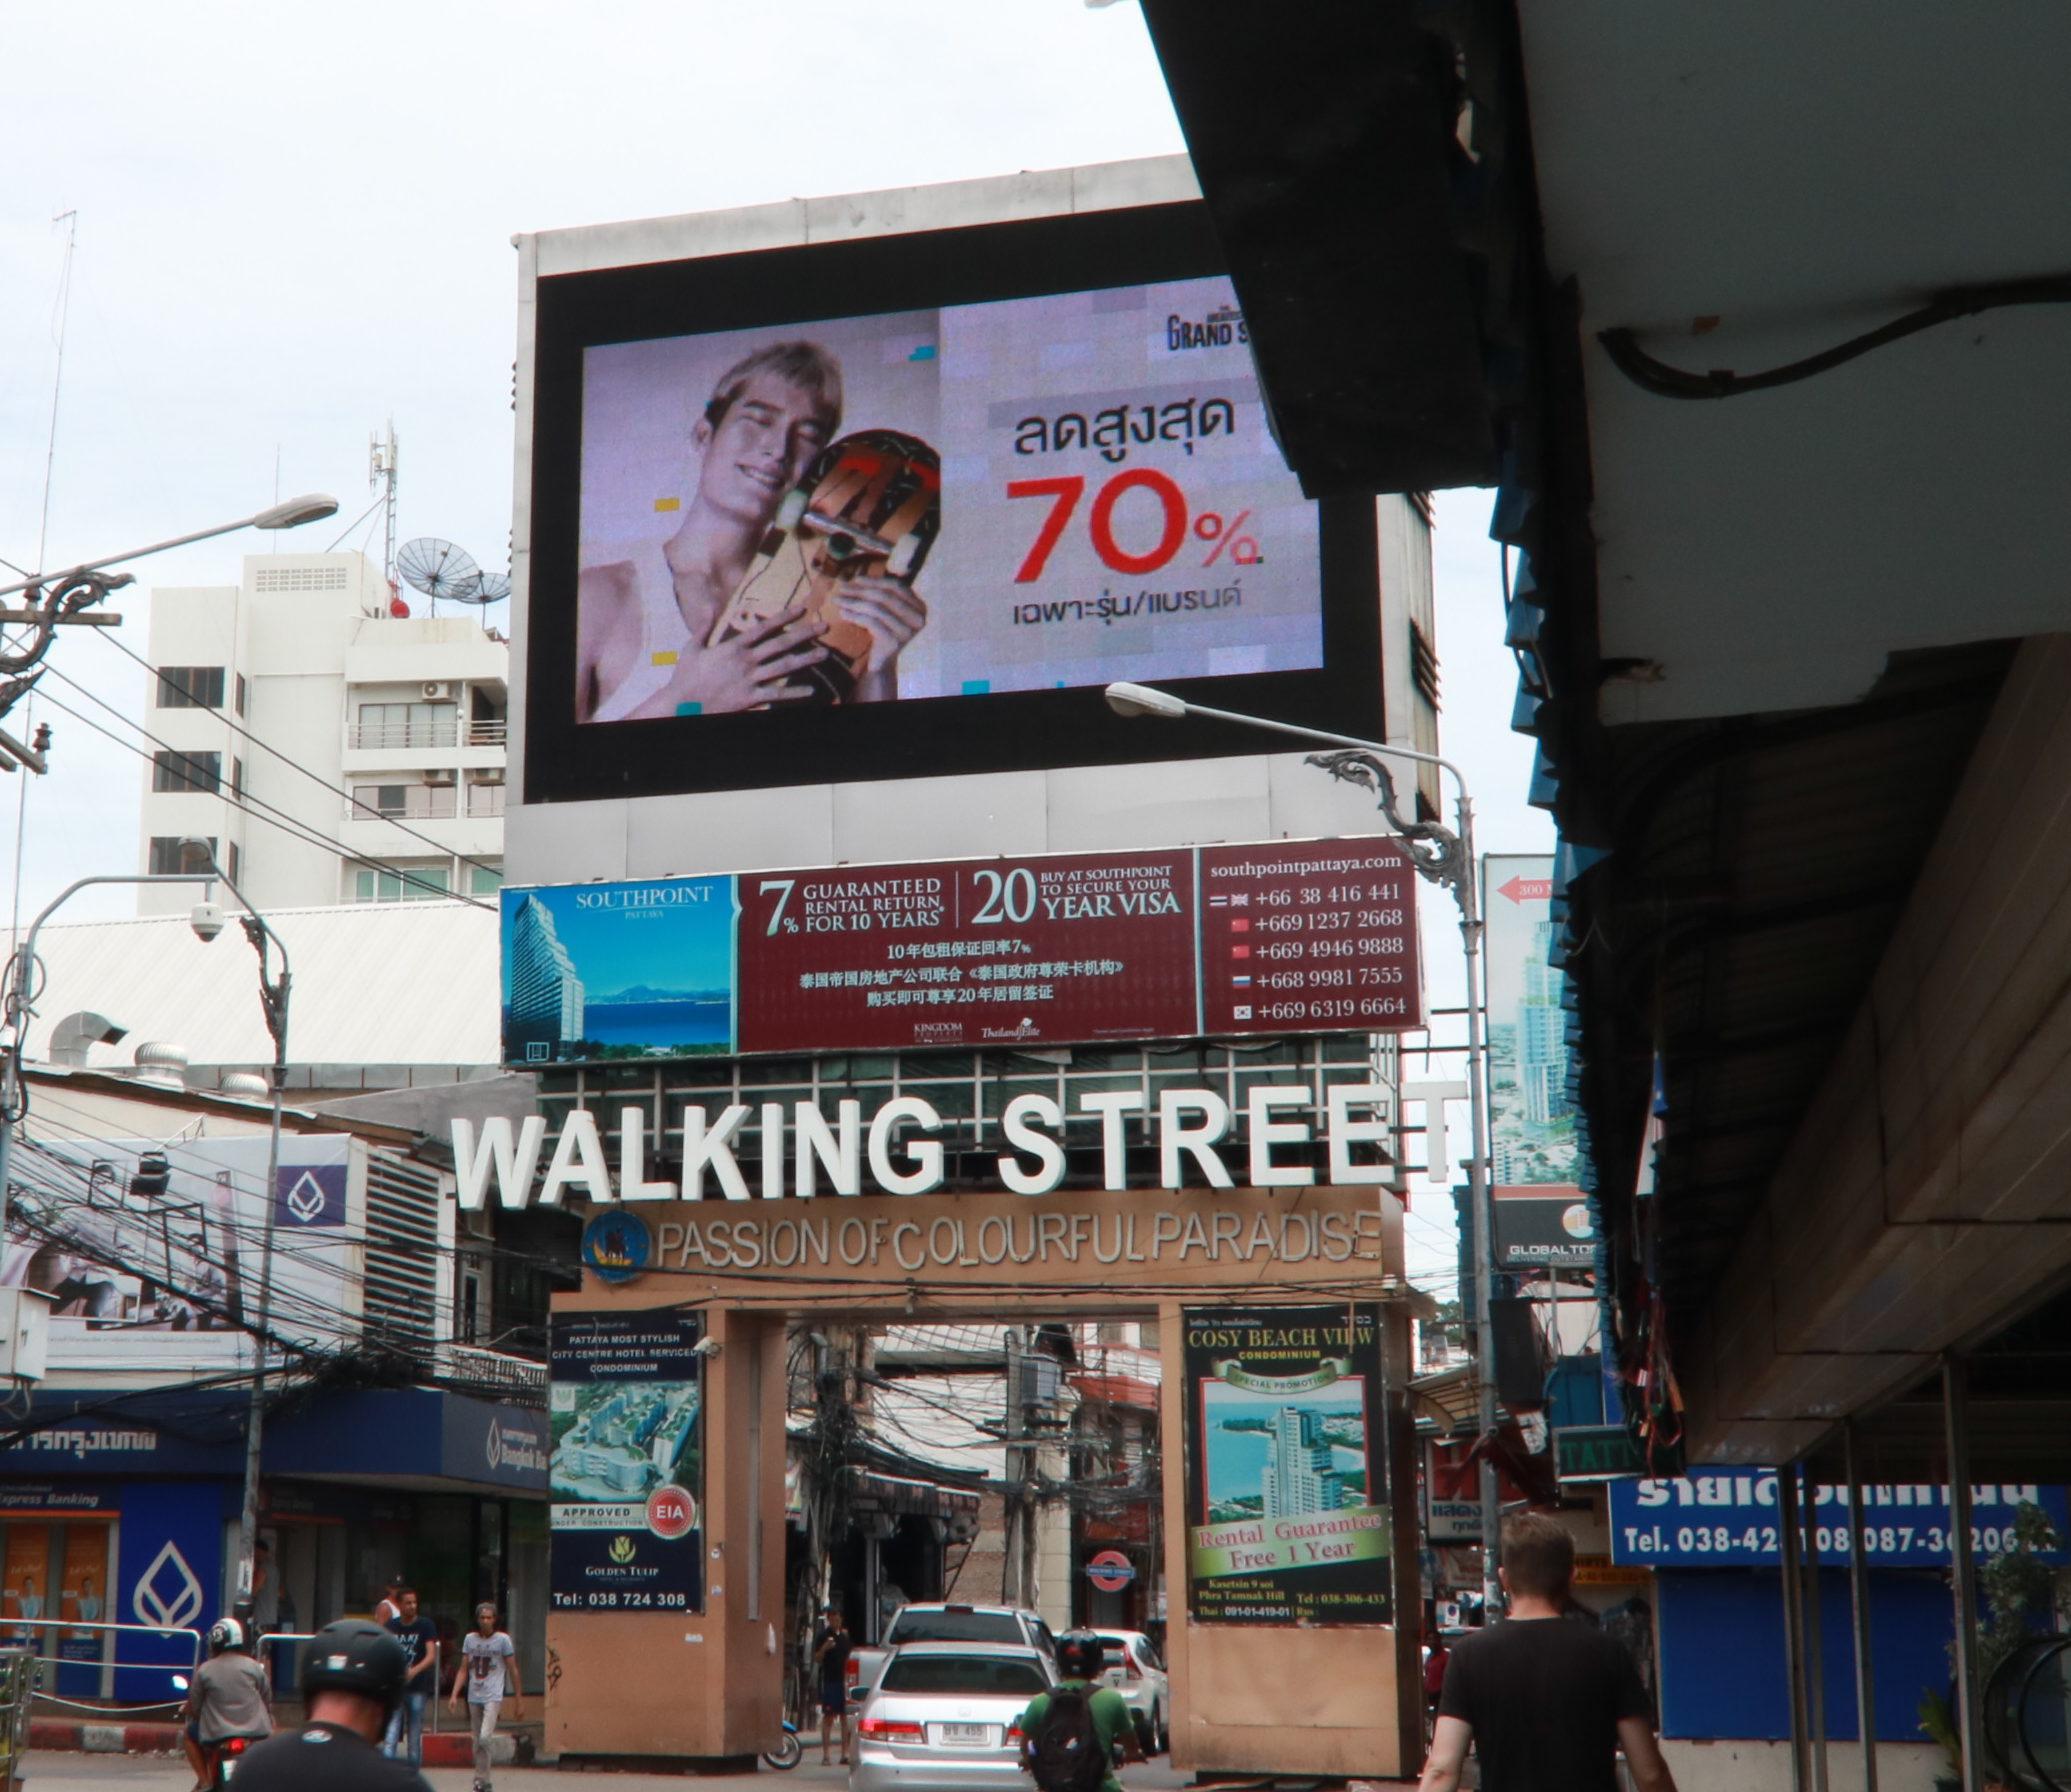 IMG 2006 e1507514807626 - Walking Street Pattaya TH